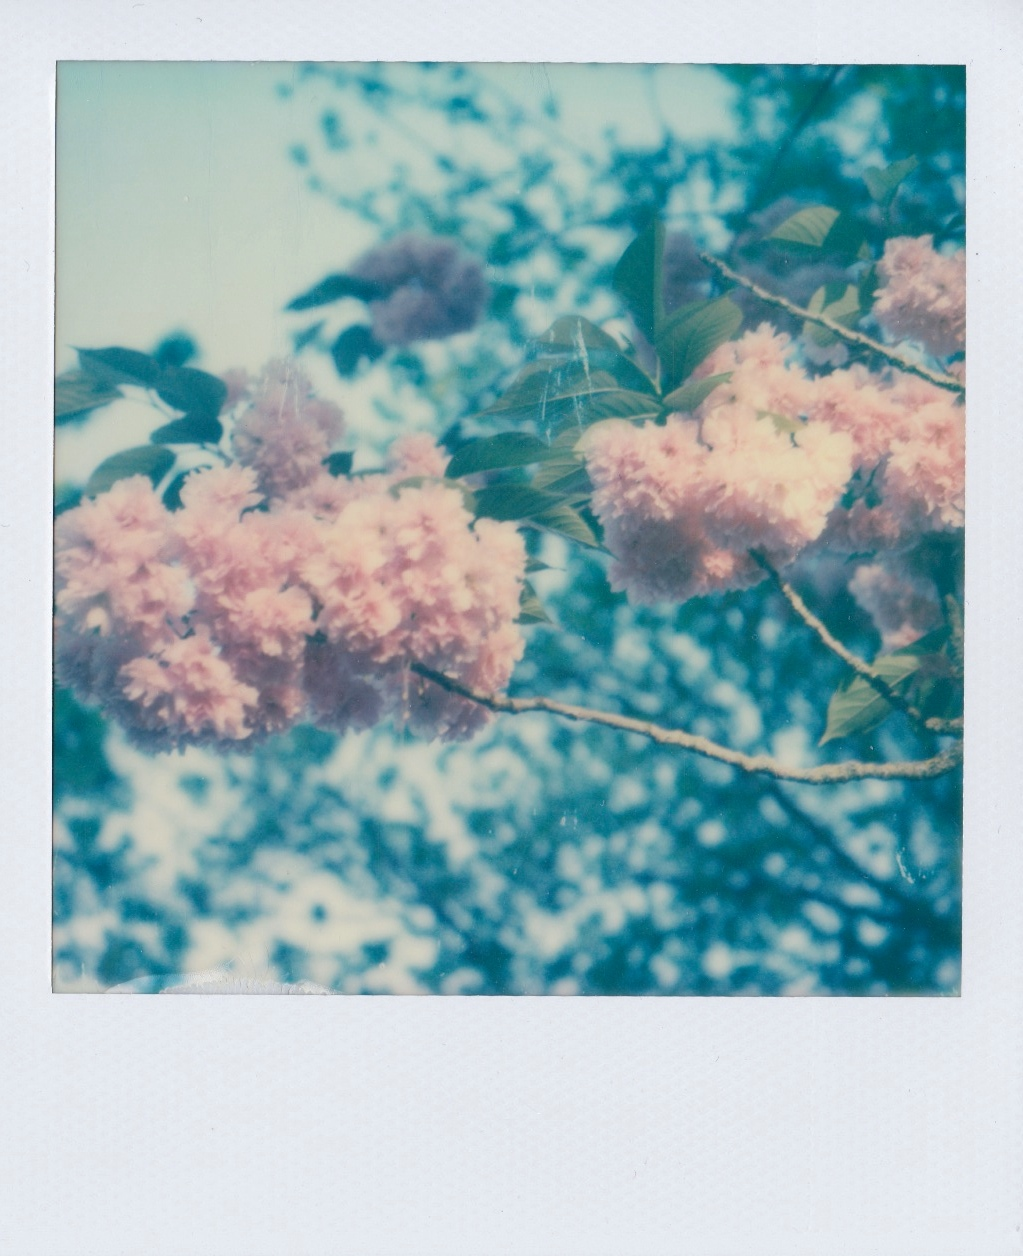 polaroid 600 Fleur